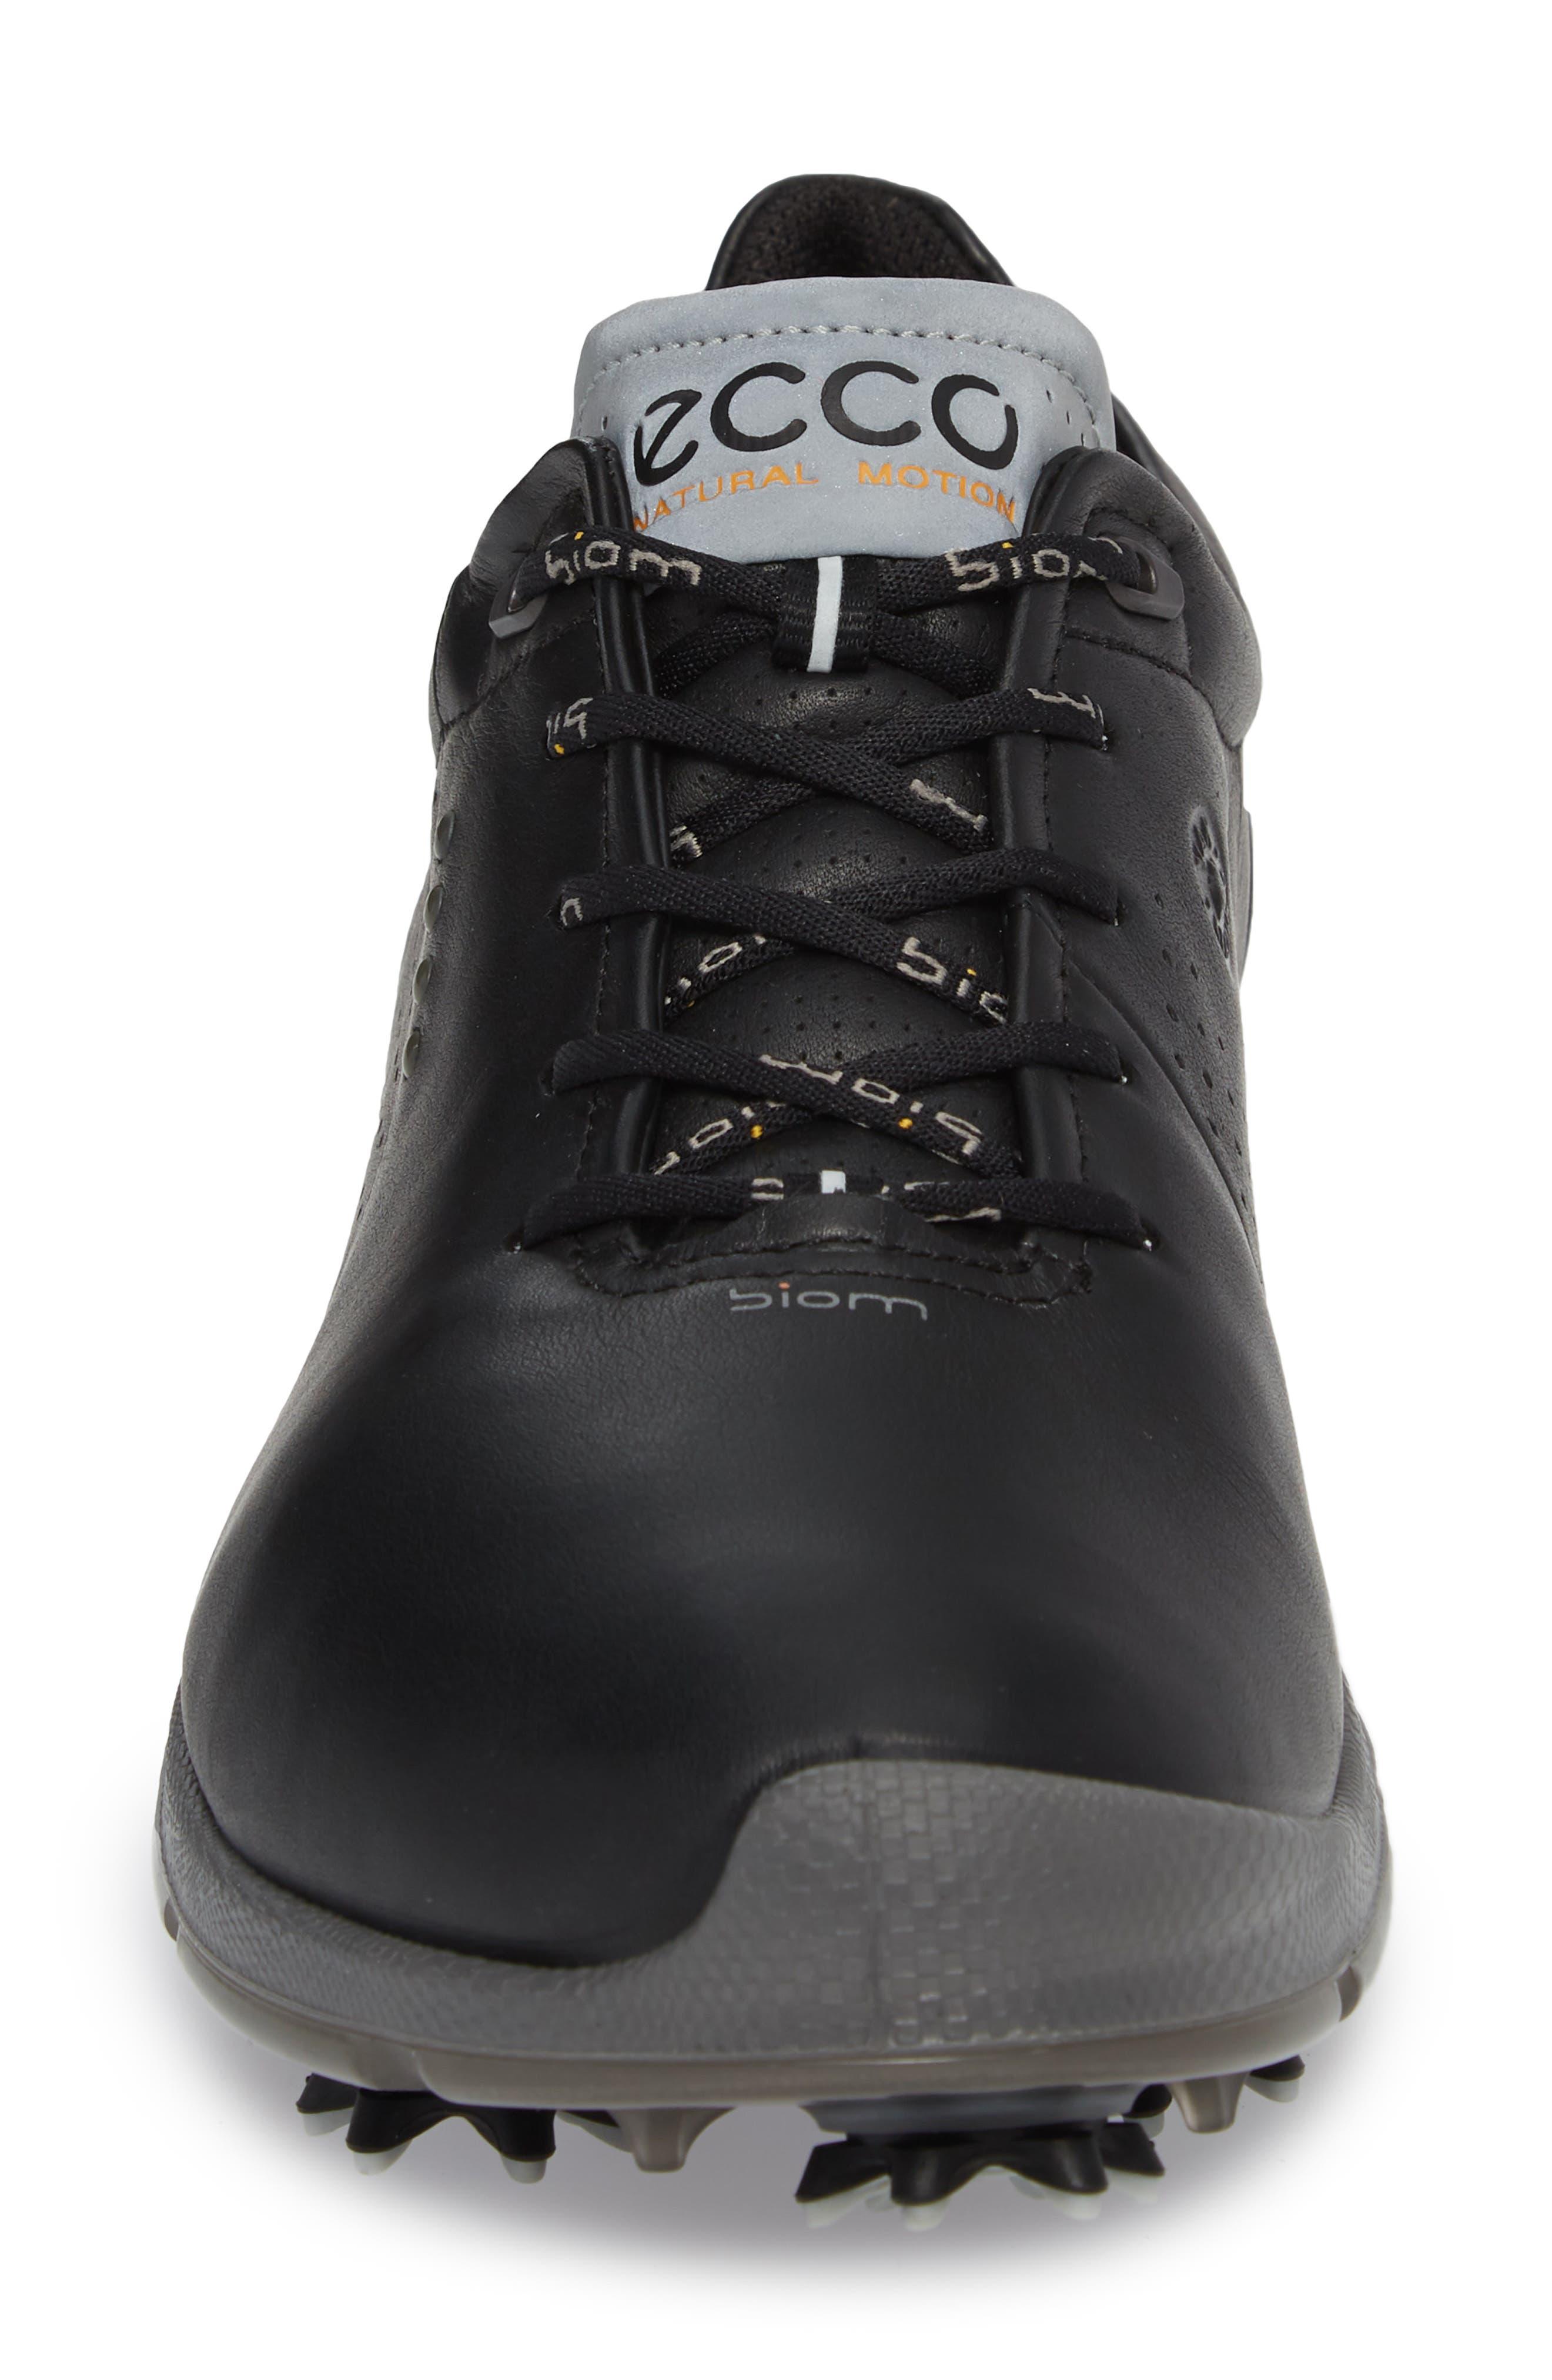 BIOM G 2 Free Gore-Tex<sup>®</sup> Golf Shoe,                             Alternate thumbnail 4, color,                             Black Leather